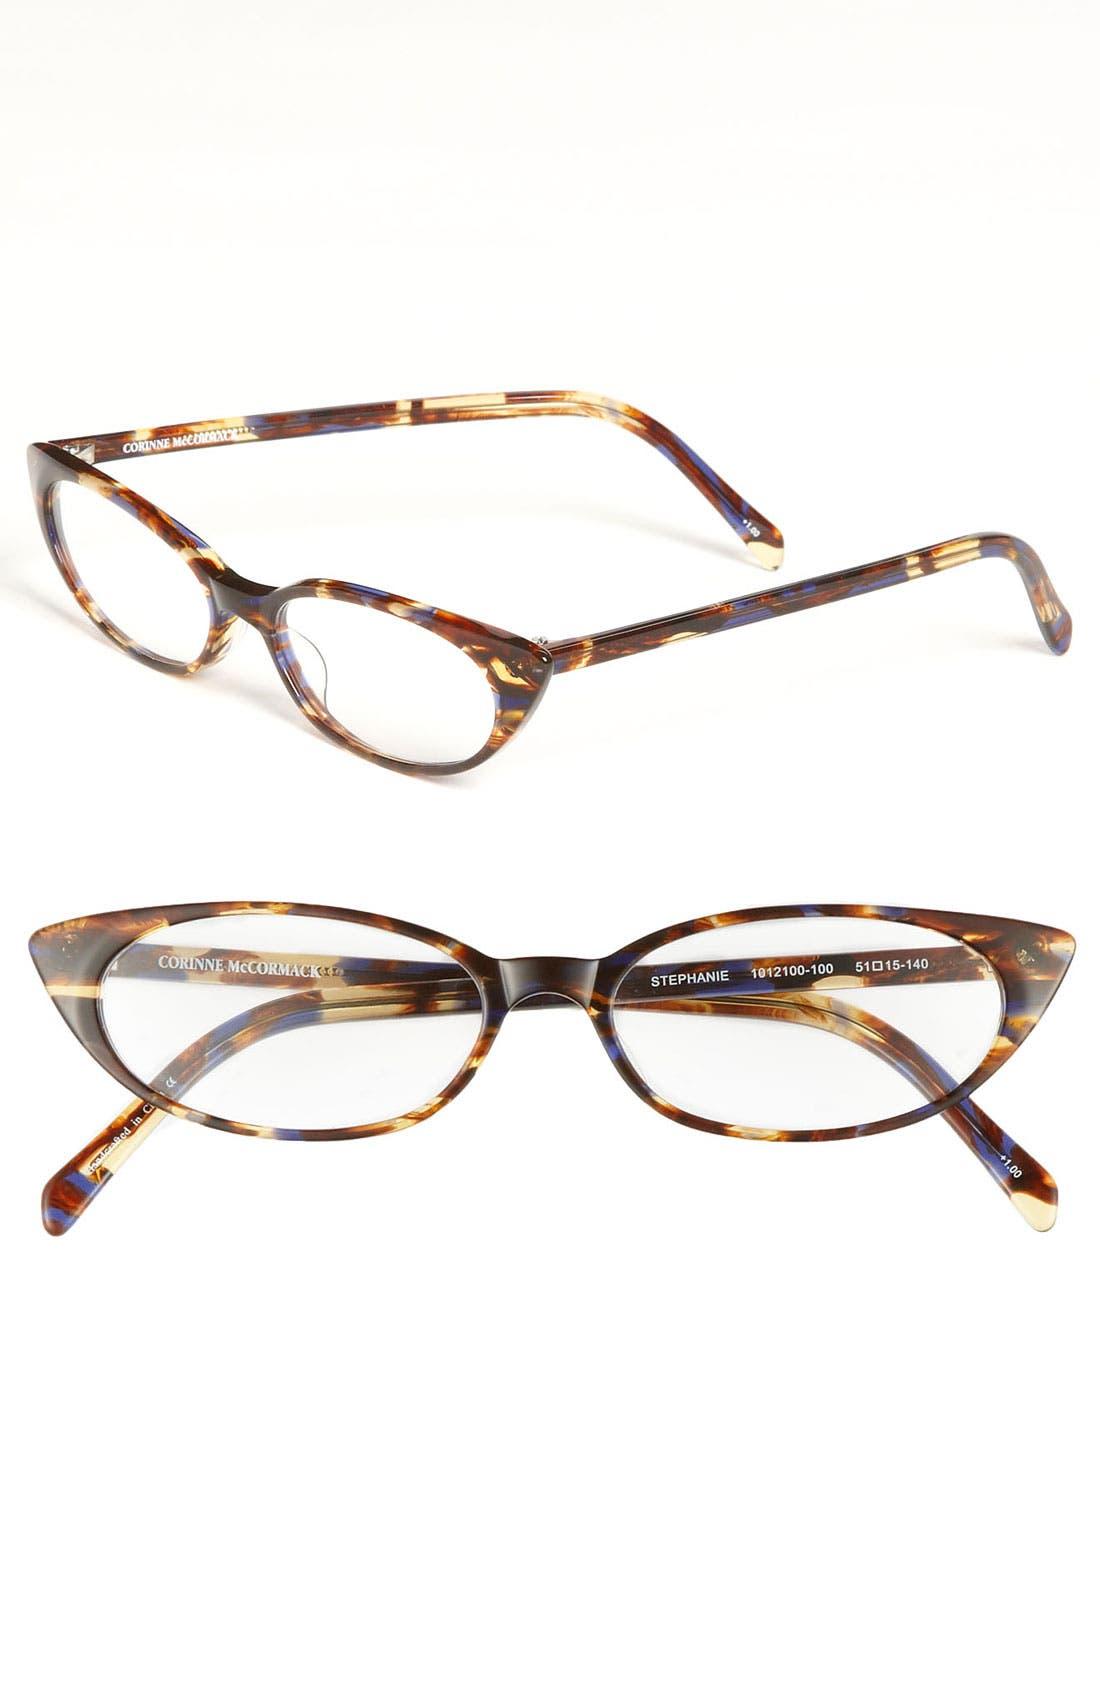 Alternate Image 1 Selected - Corinne McCormack 51mm Reading Glasses